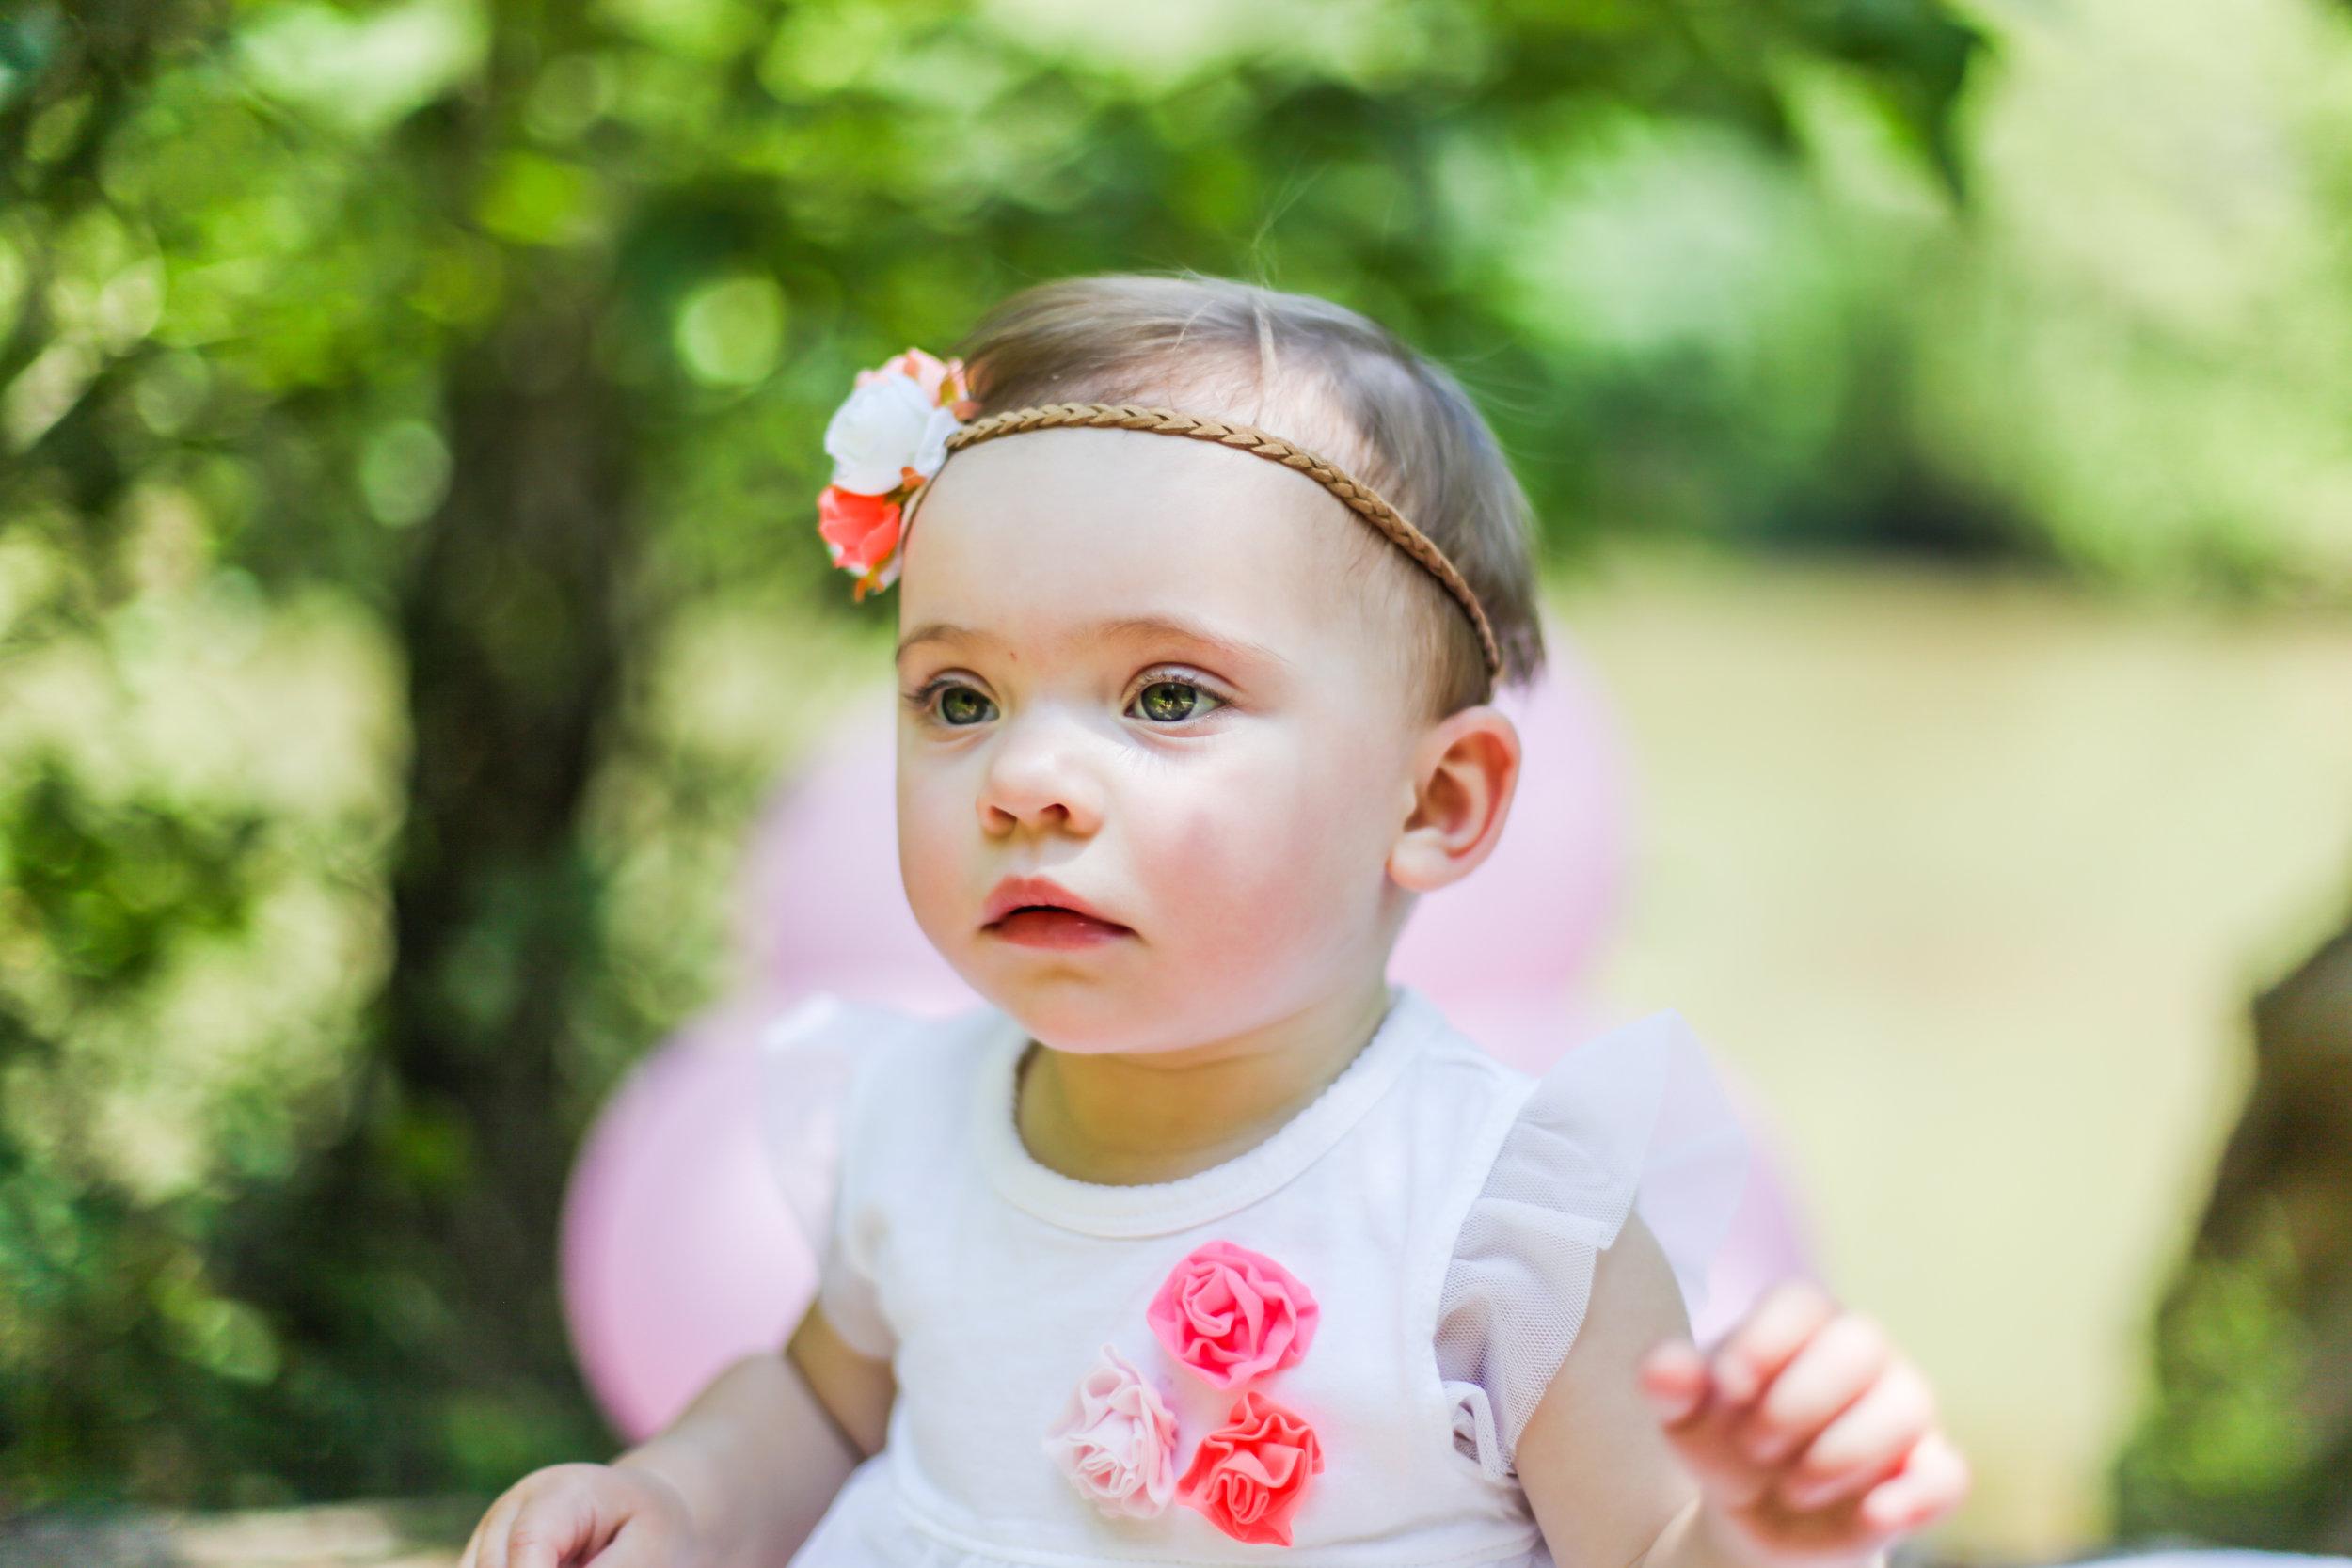 woodstock baby photography angela elliott-72.jpg